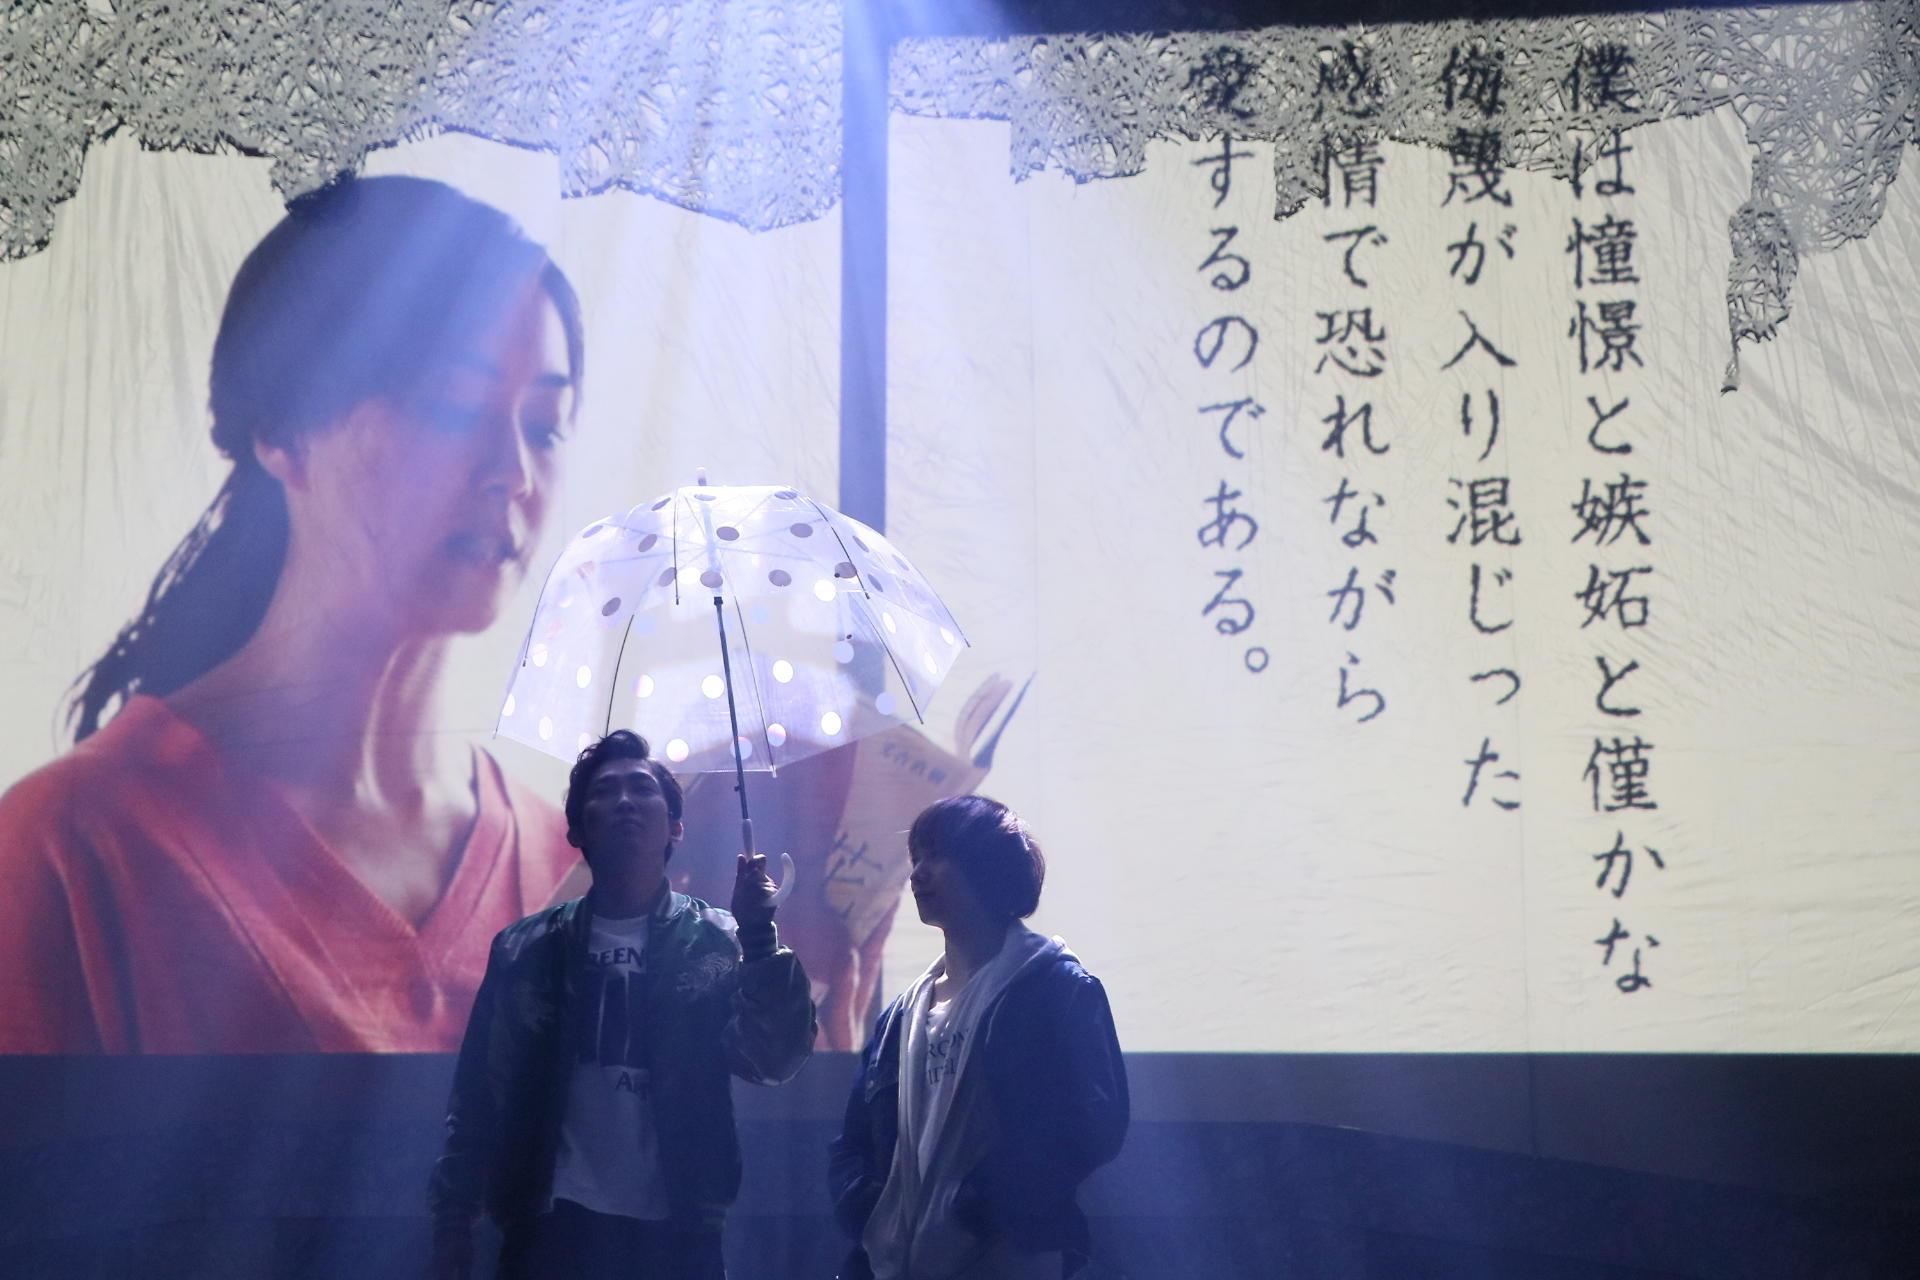 http://news.yoshimoto.co.jp/20180330225251-61d832b1de79af8c1befe01616acccbbb1d03588.jpg